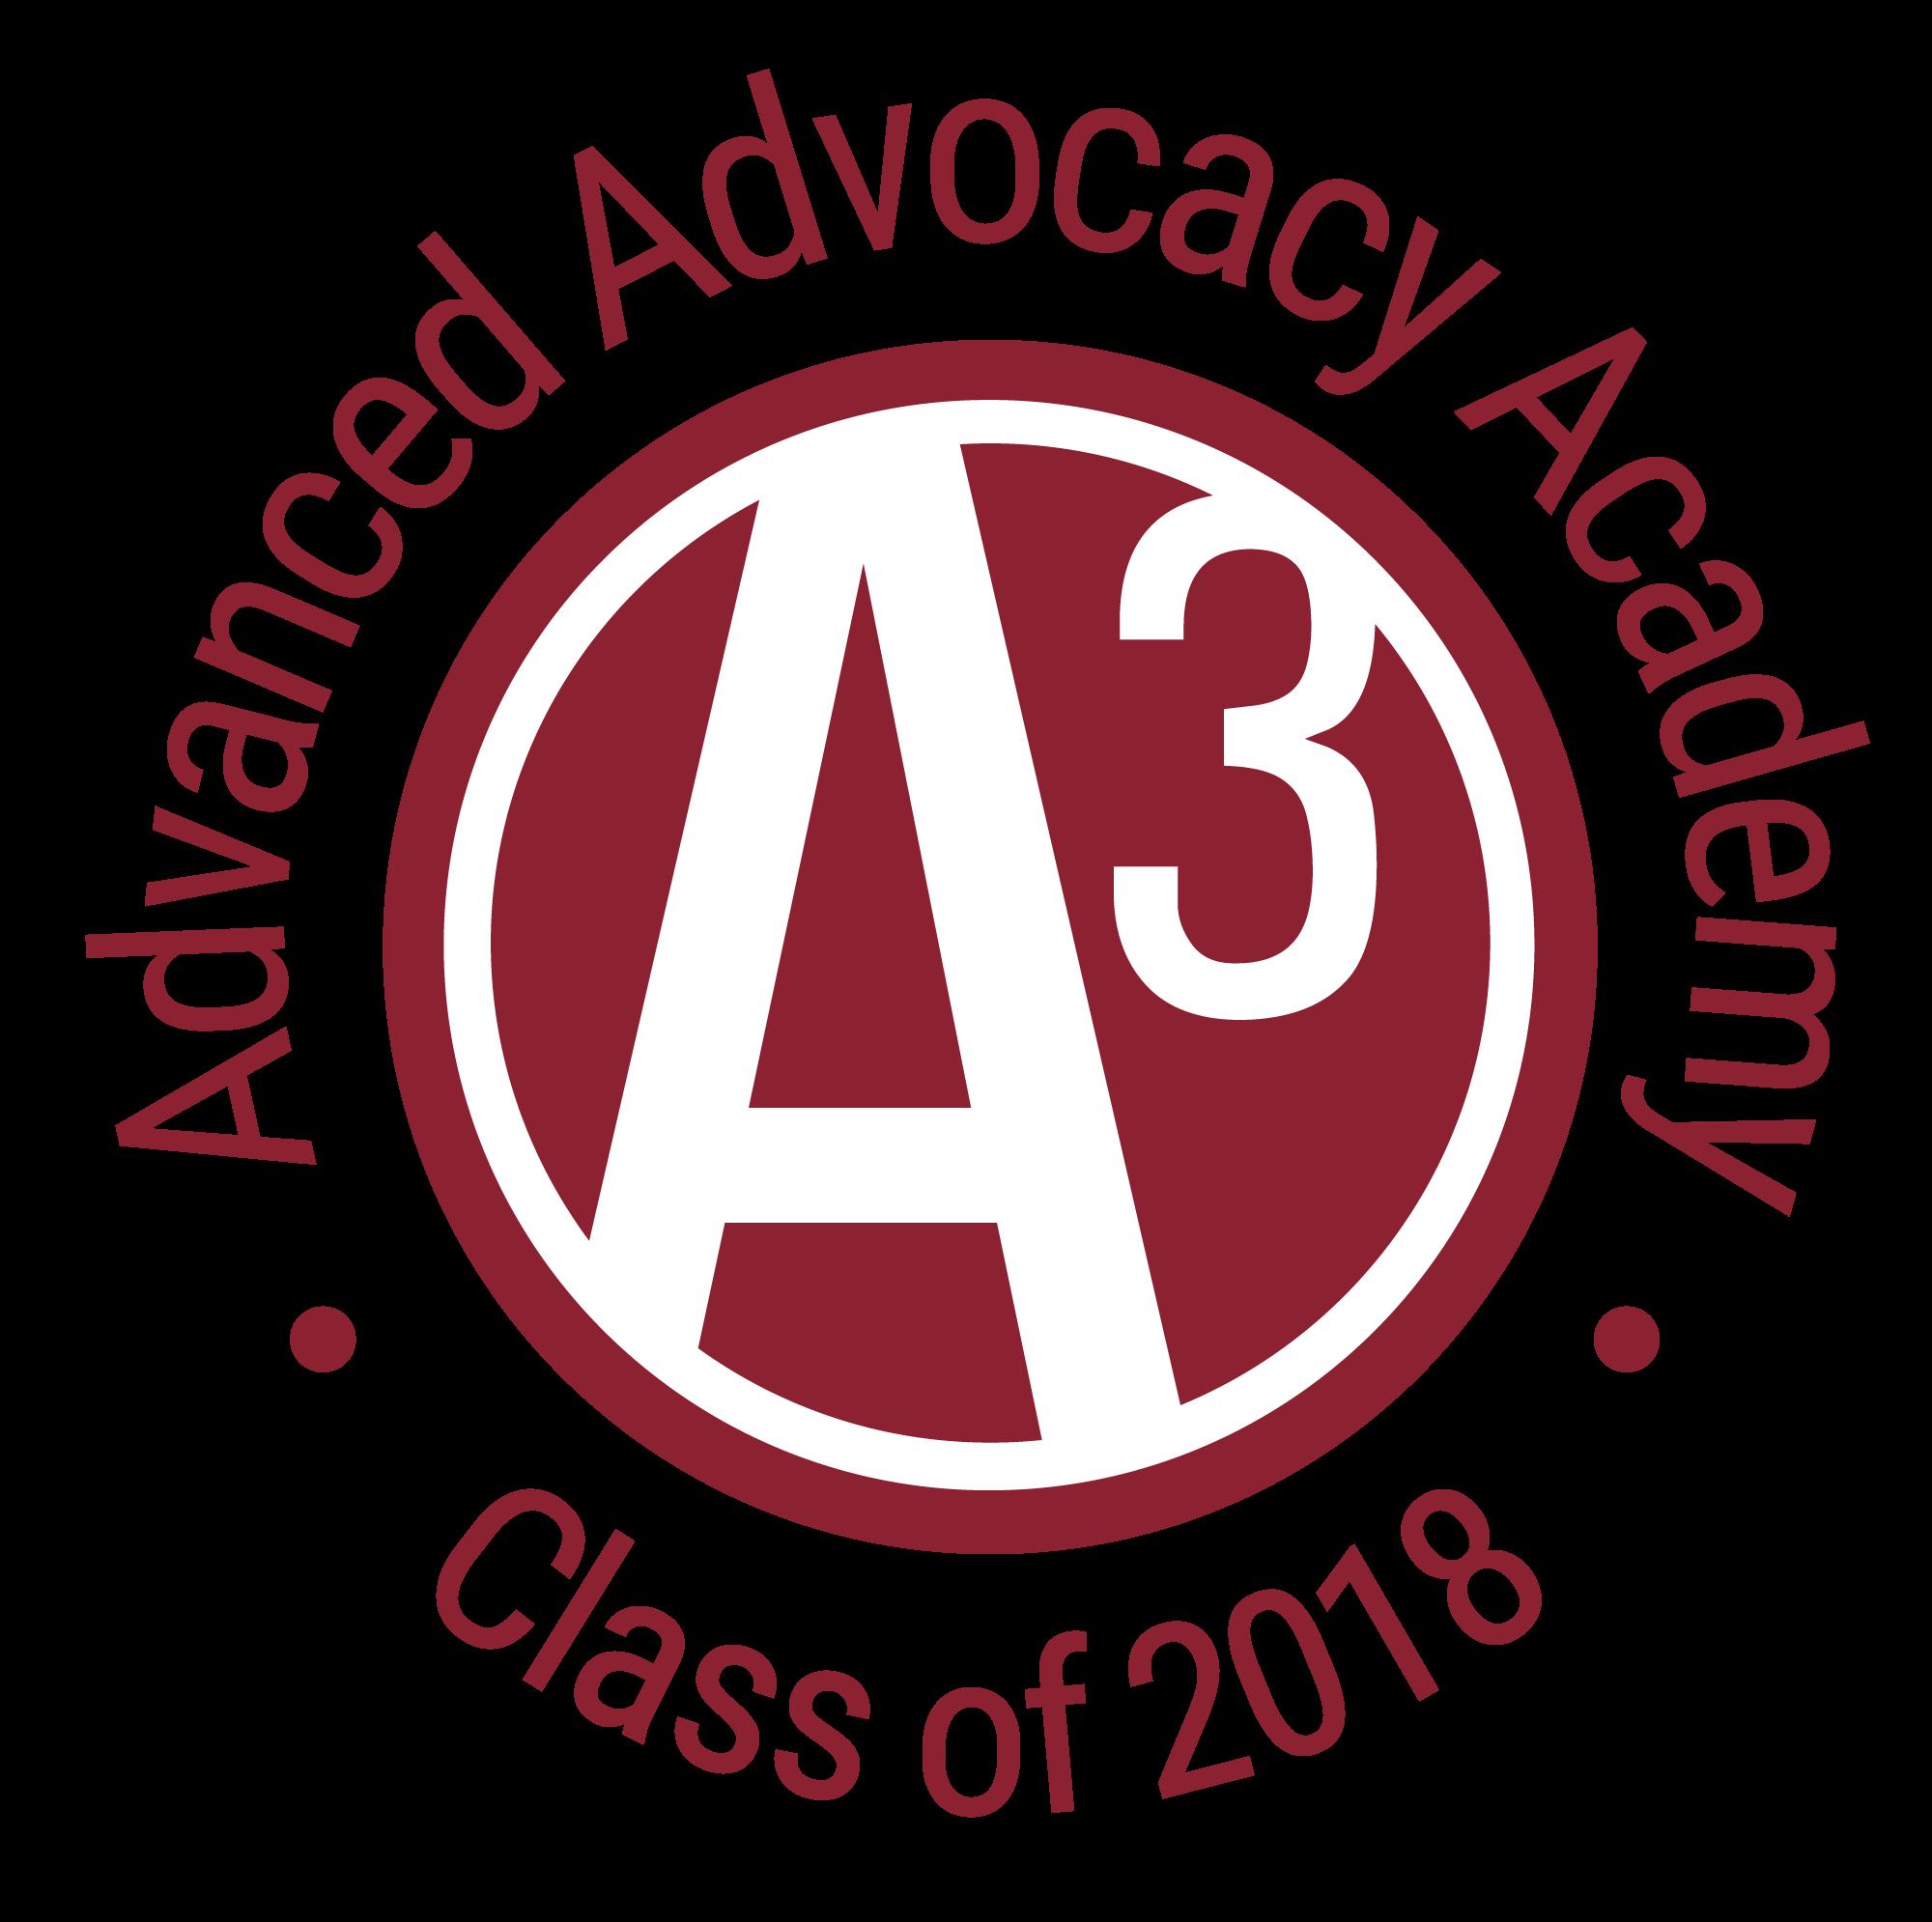 a3-class-of-2018-xxl.png